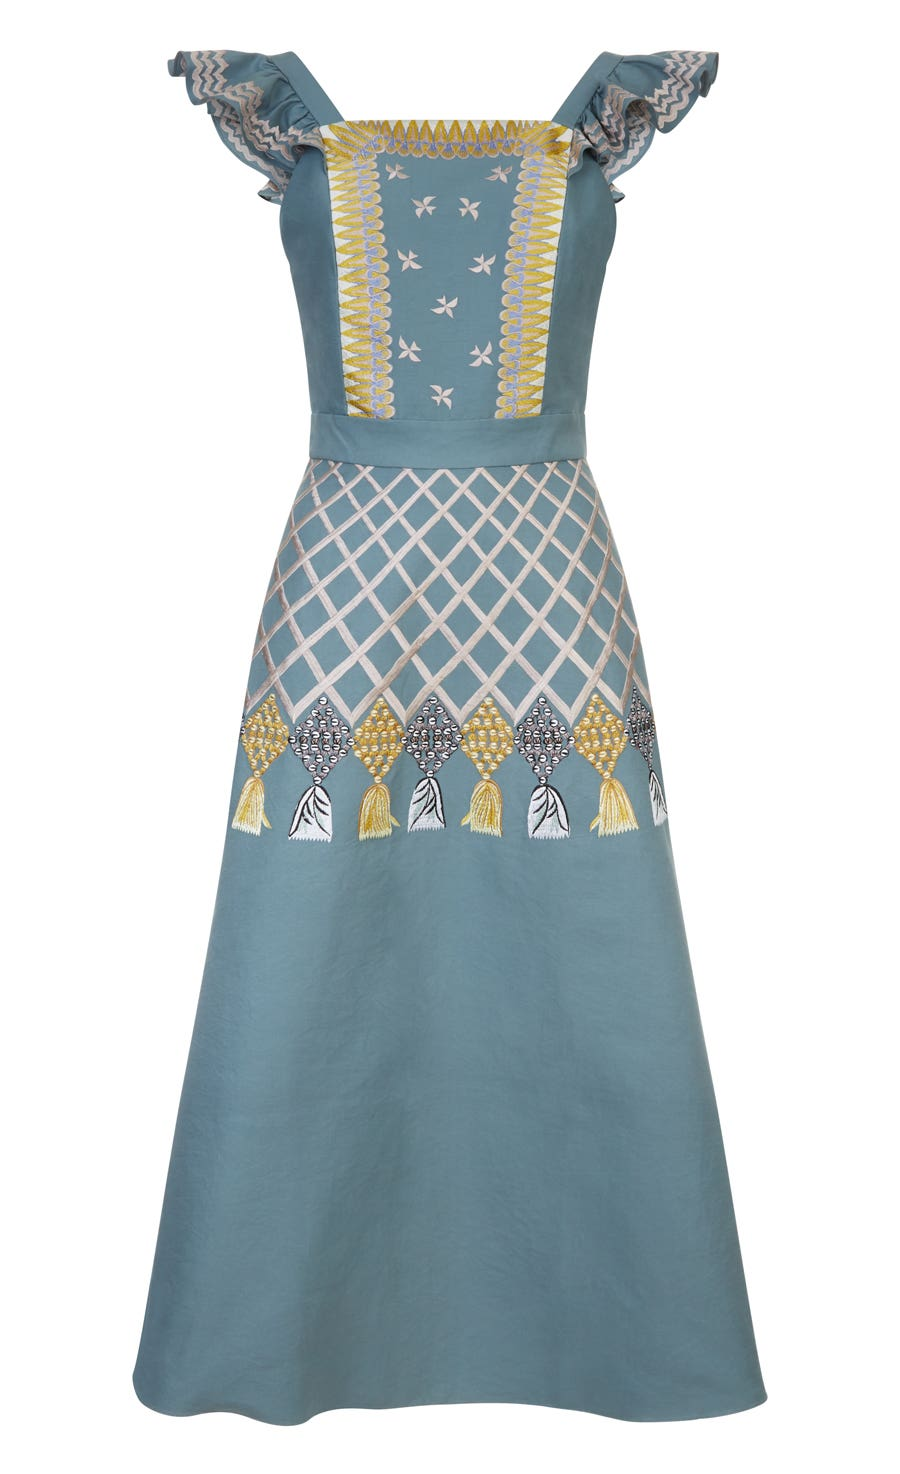 Poppy Field Dress, Fern Mix